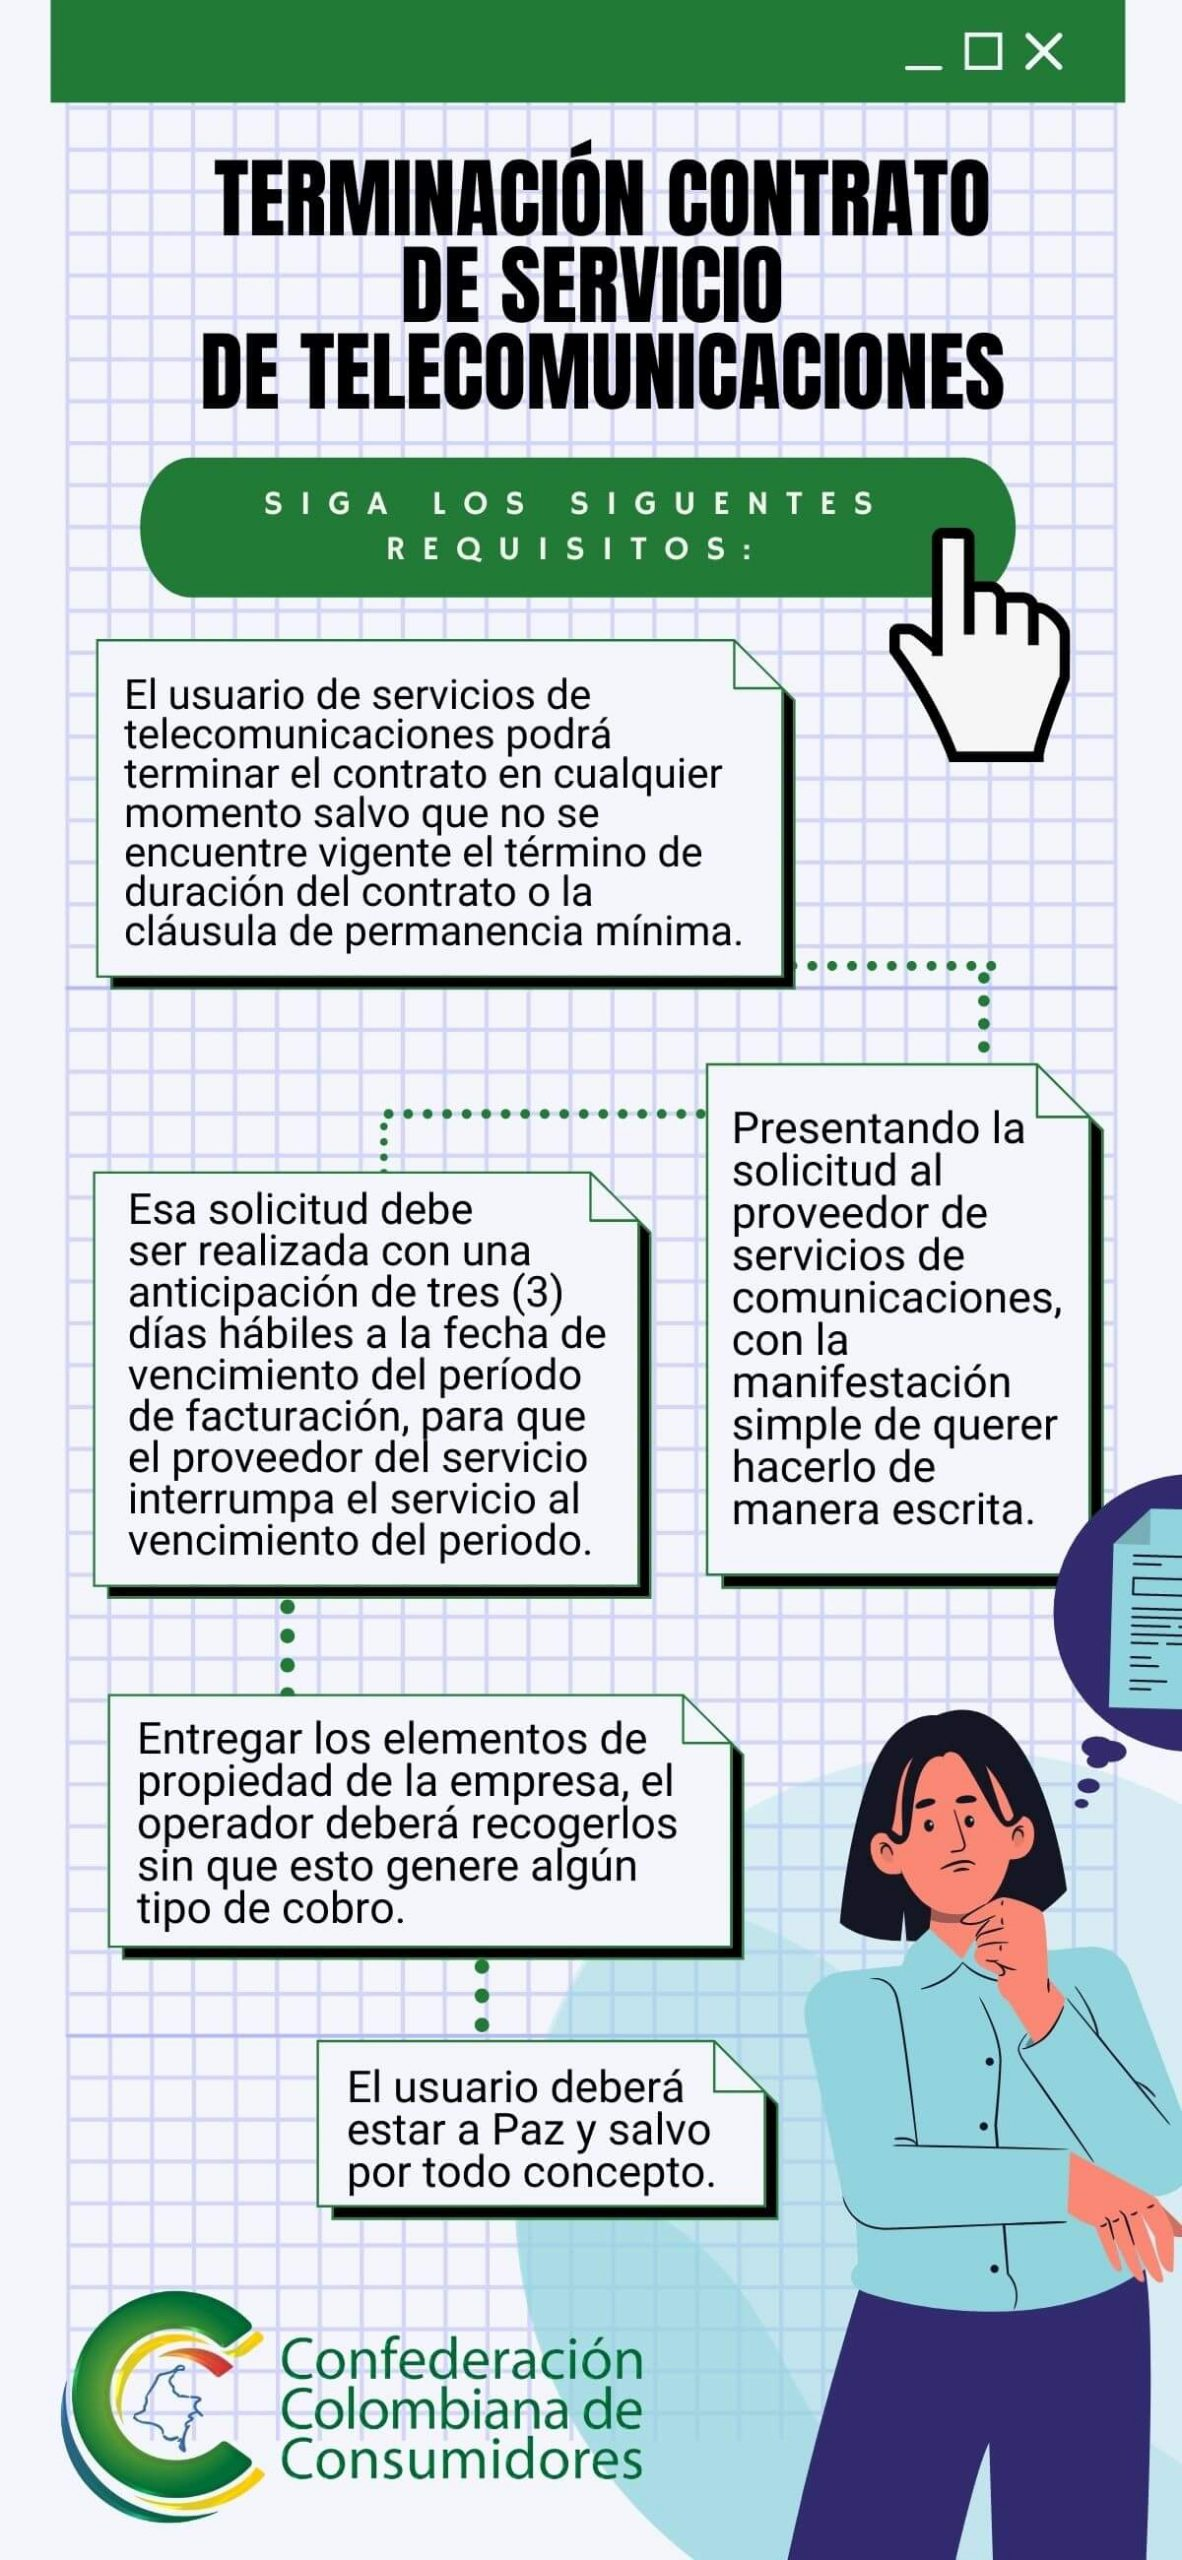 Terminación contrato servicios de telecomunicaciones